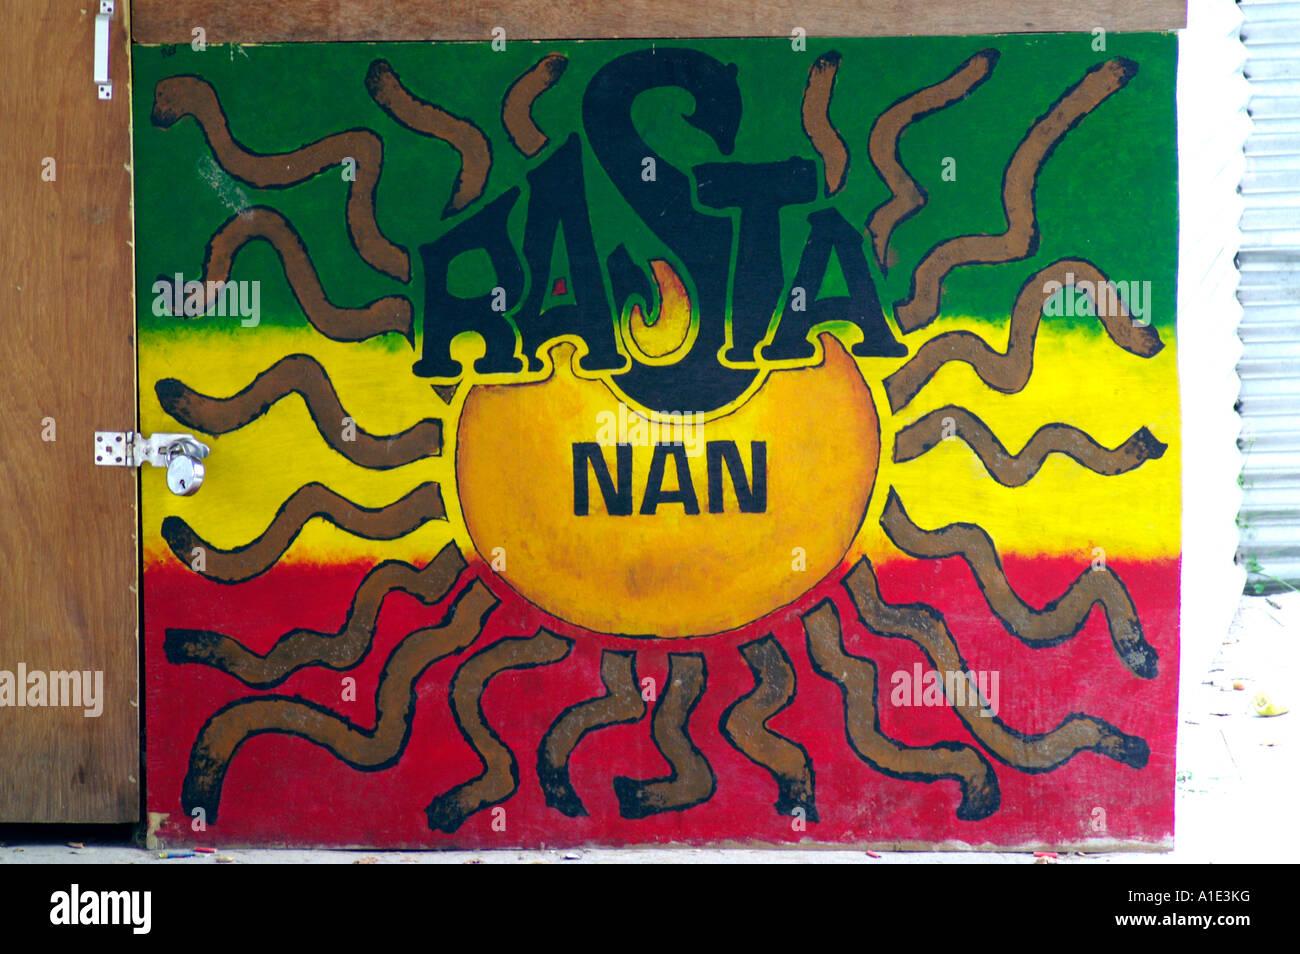 Rasta nan sign and logo, stylised indian Nan bread and rastafarian symbol rasta man jamaican flag, Kaso village, - Stock Image